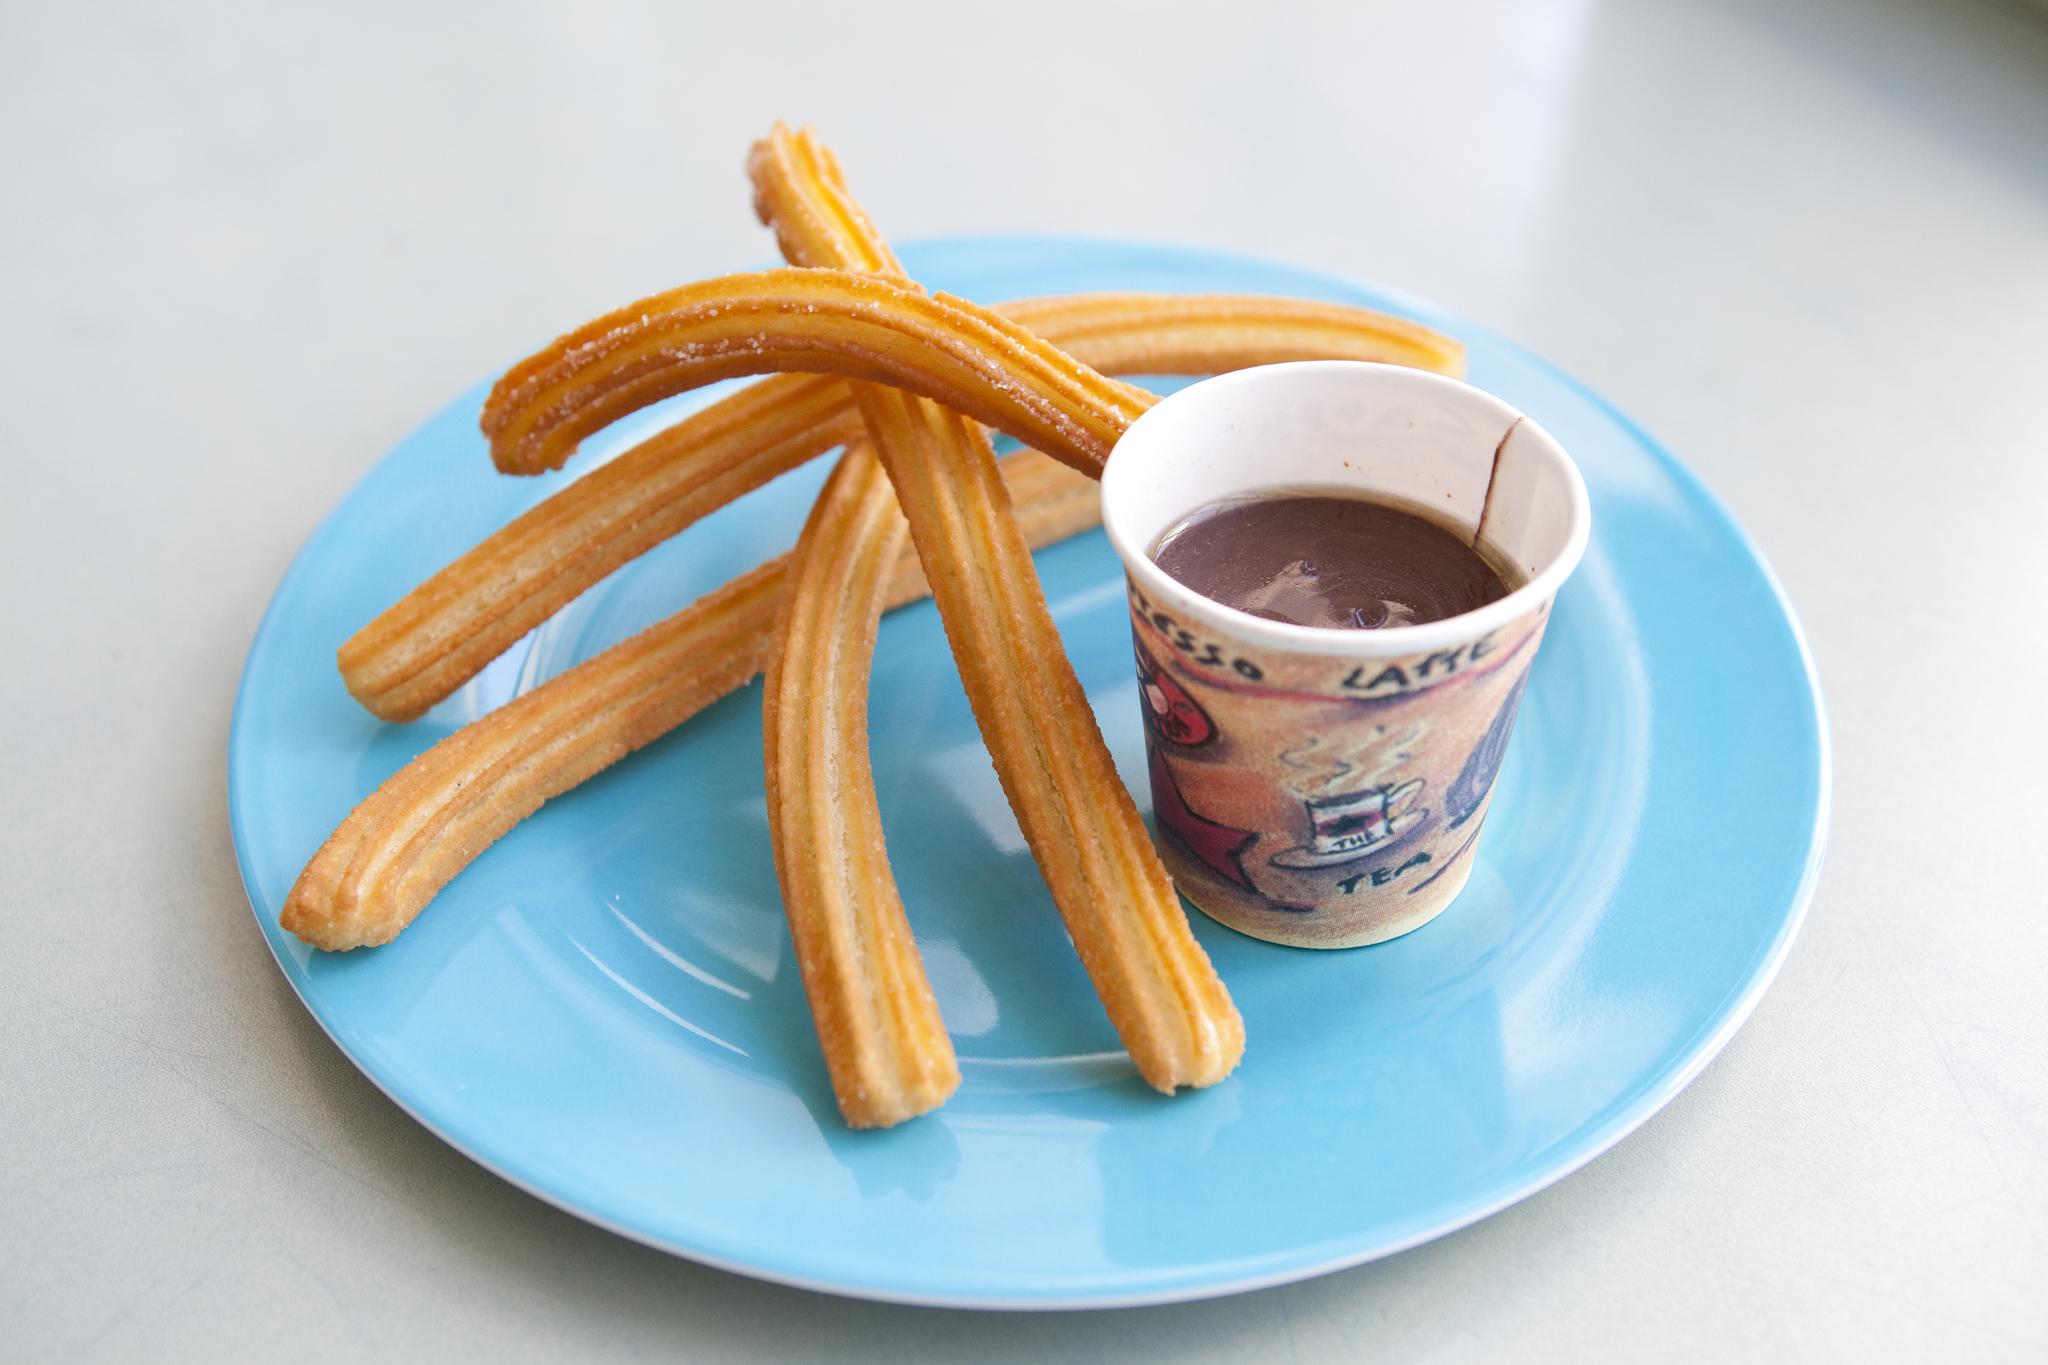 Best chocolate (but not-too-chocolate) dessert: La Churreria churros